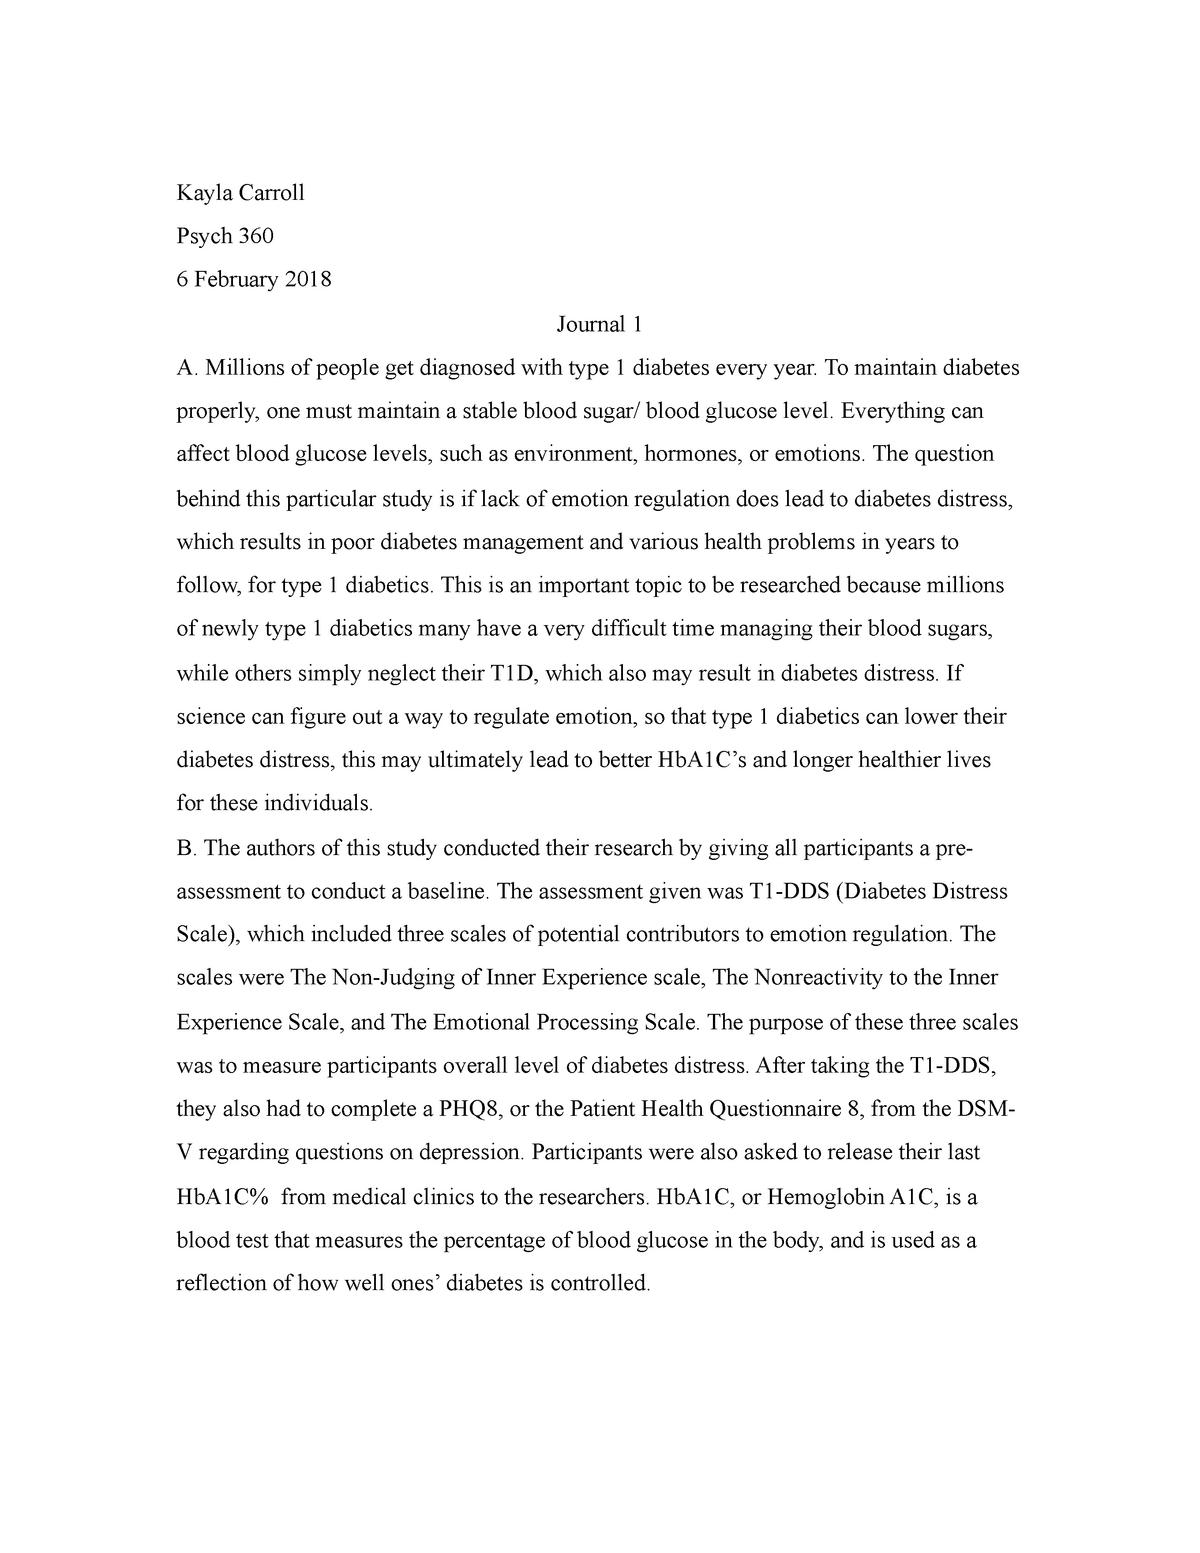 Journal 1 PDF - Prof  Lowe - PSYC 360: Biopsychology - StuDocu